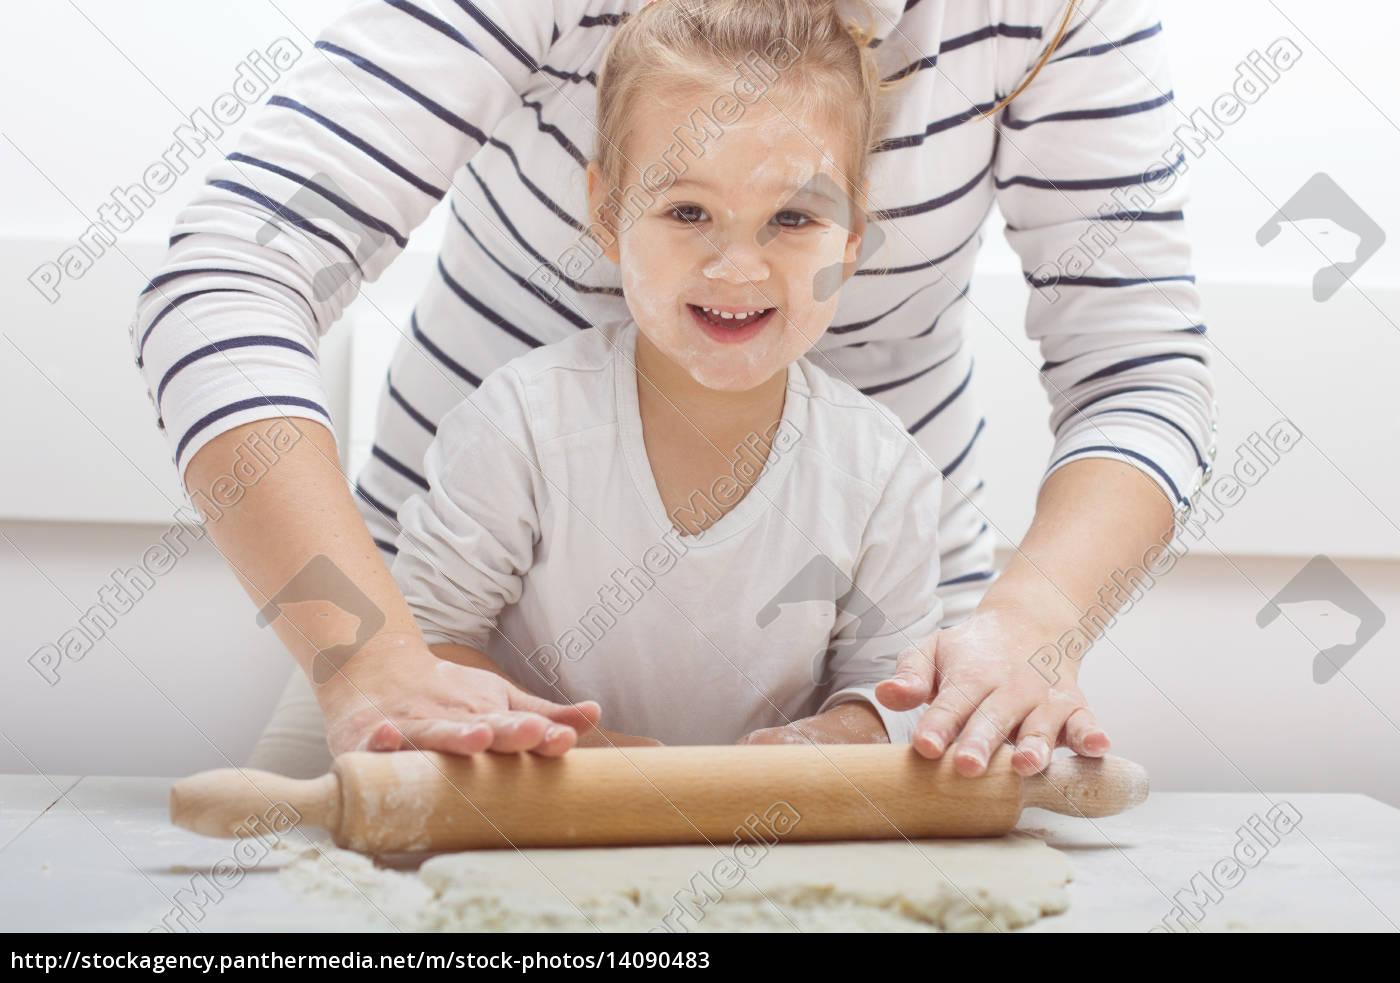 , teamwork, kneading, dough - 14090483